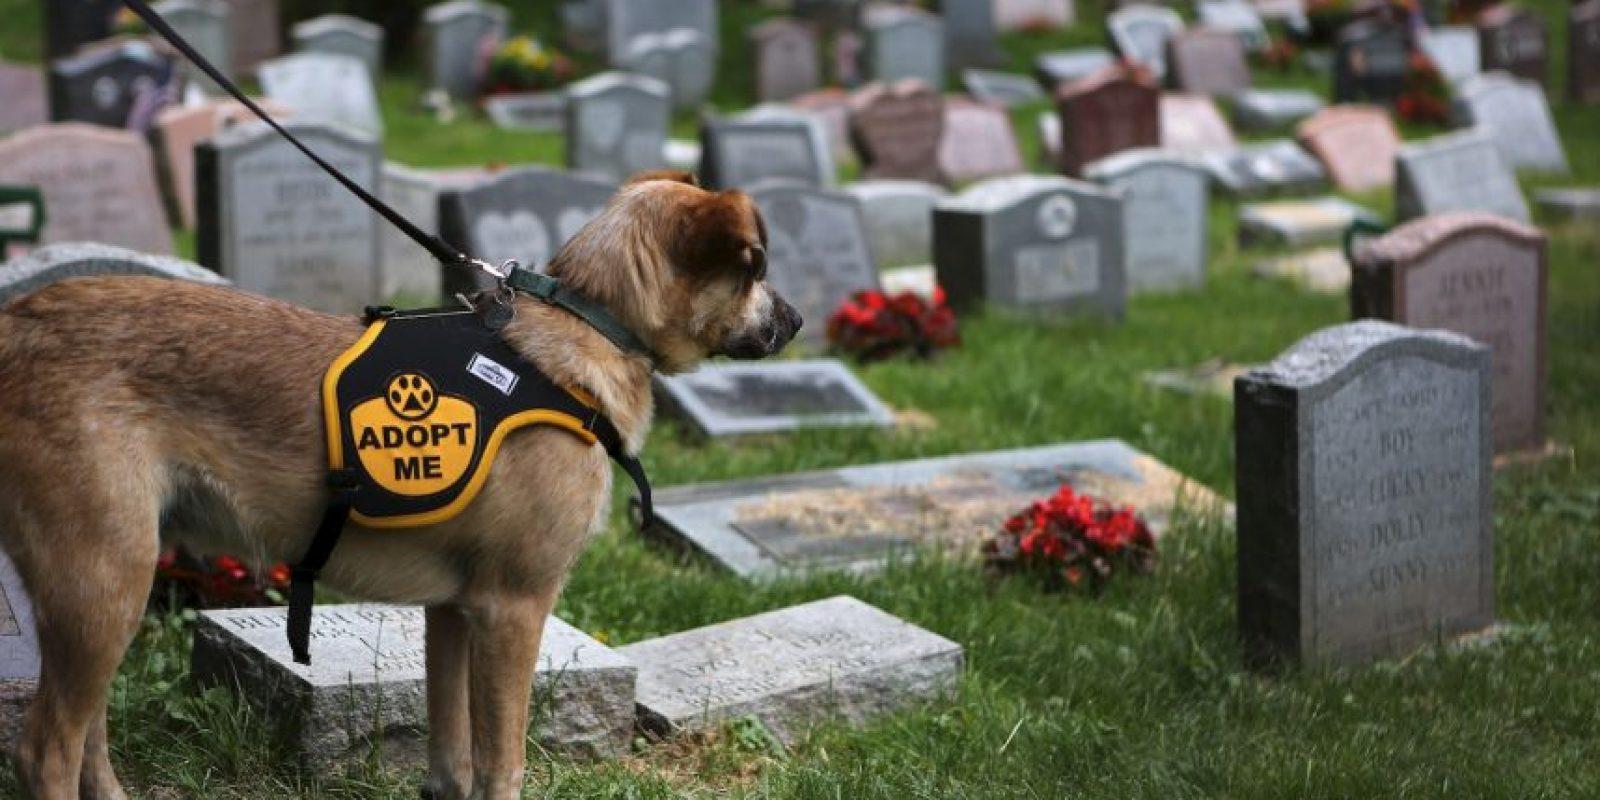 Aspectos a considerar antes de adoptar una mascota. Foto:Getty Images